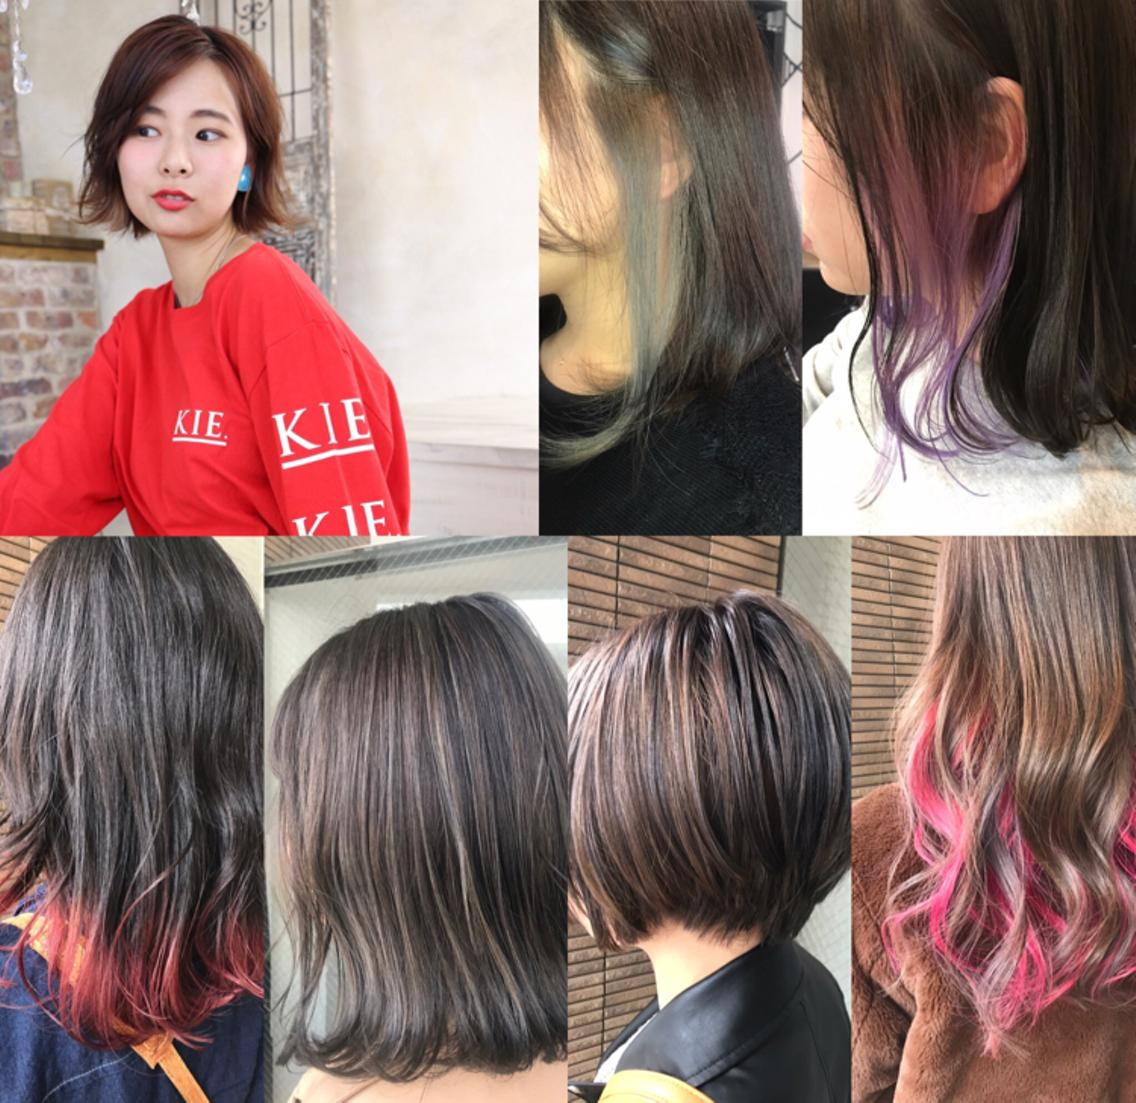 hair studio KIE./キー所属・おおいけさきの掲載